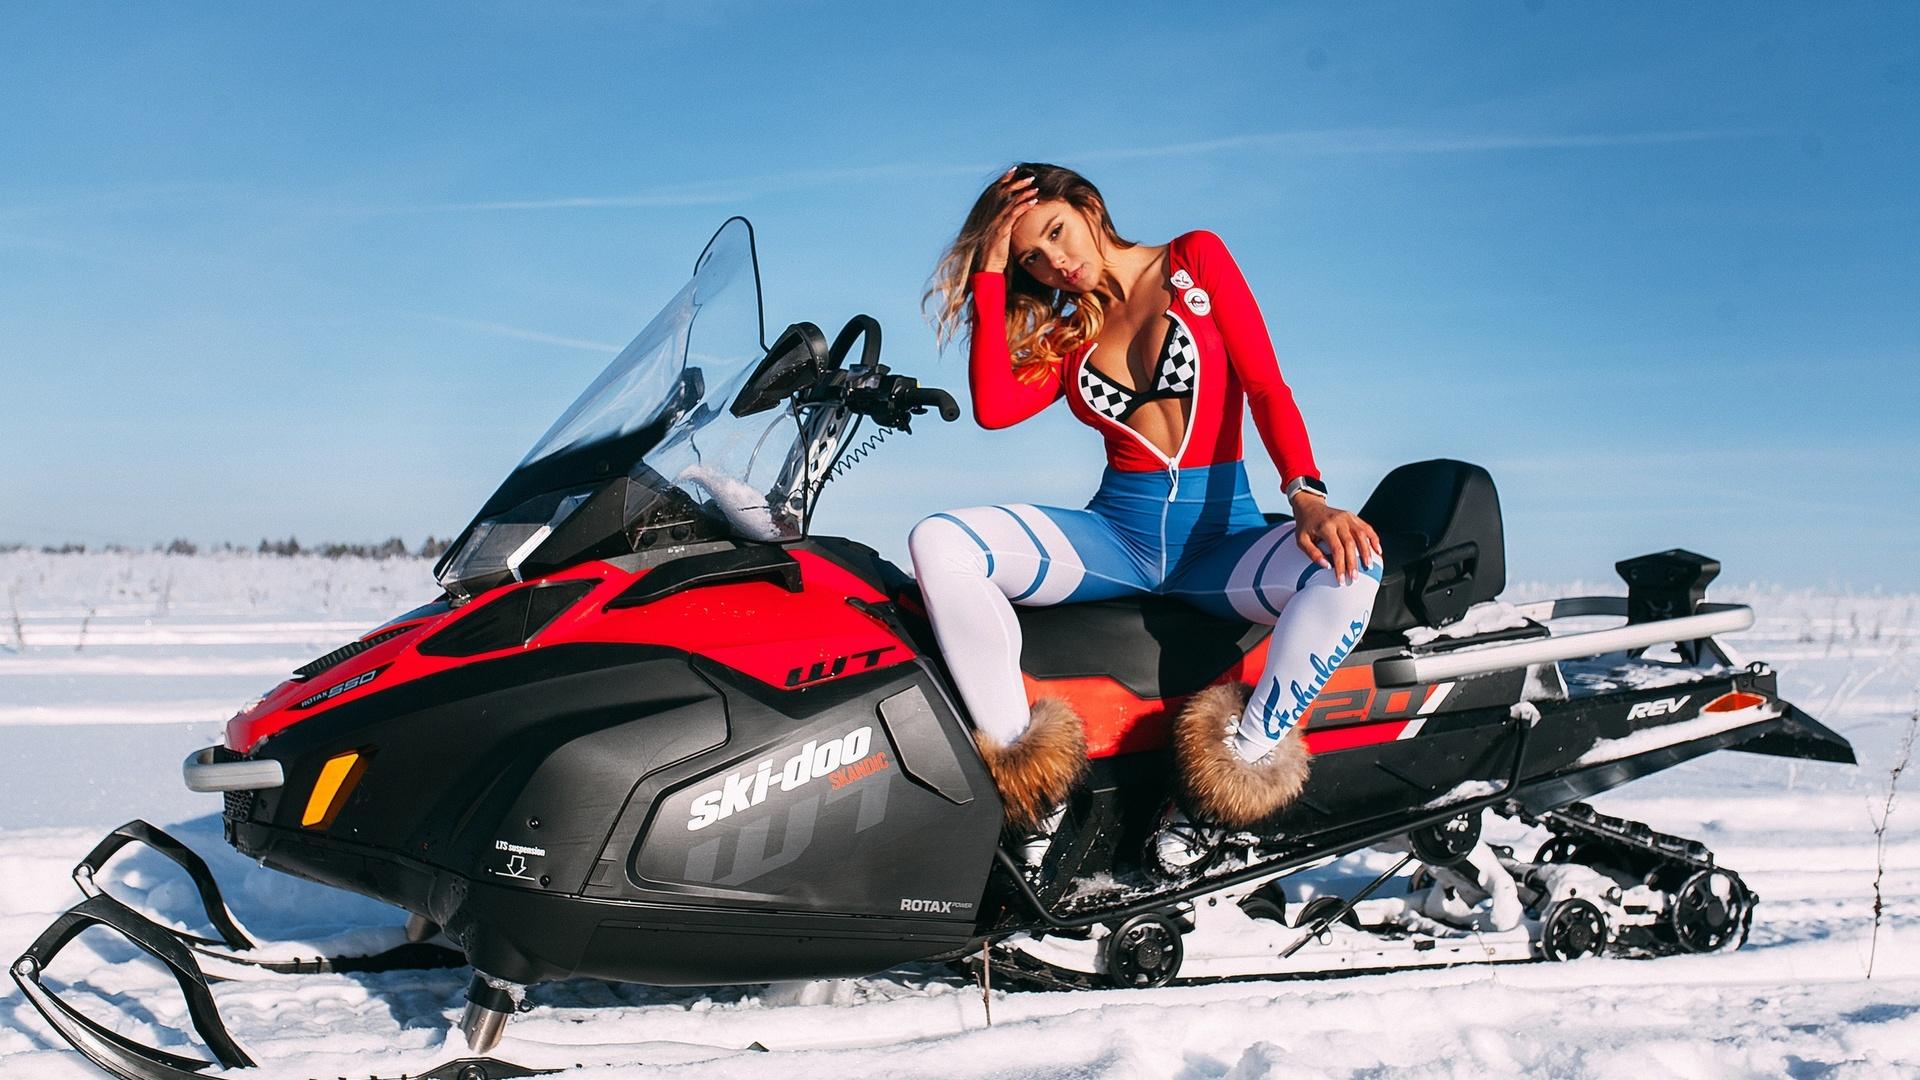 девушка, зима, снег, снегоход, взгляд,фигура,хороша,красиво